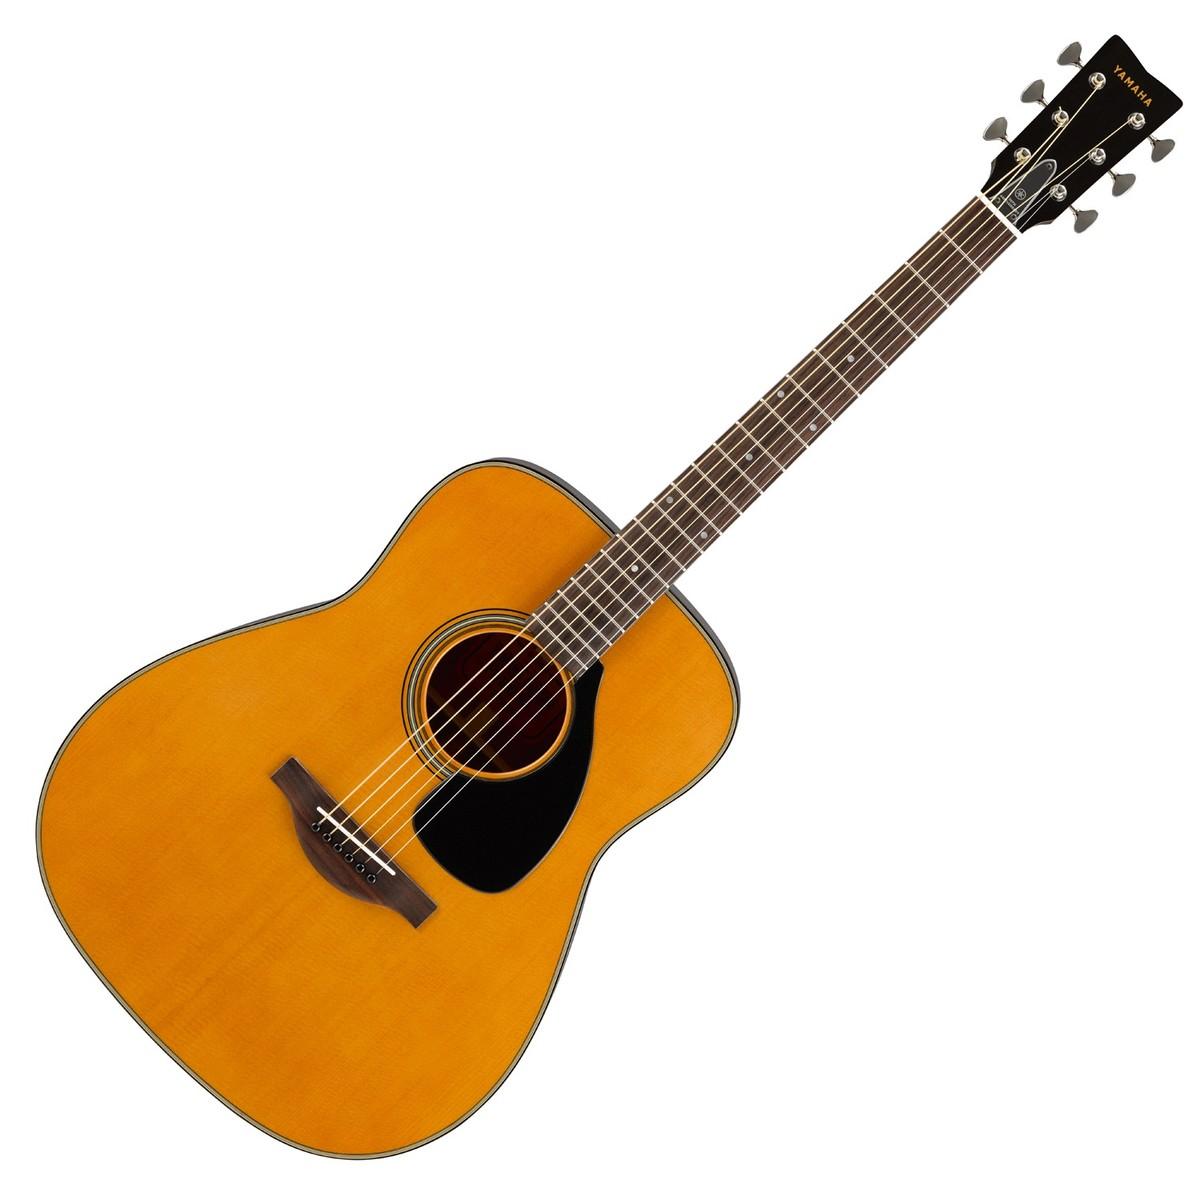 Yamaha fg180 50 anniversary model acoustic guitar natural for Yamaha guitar brands